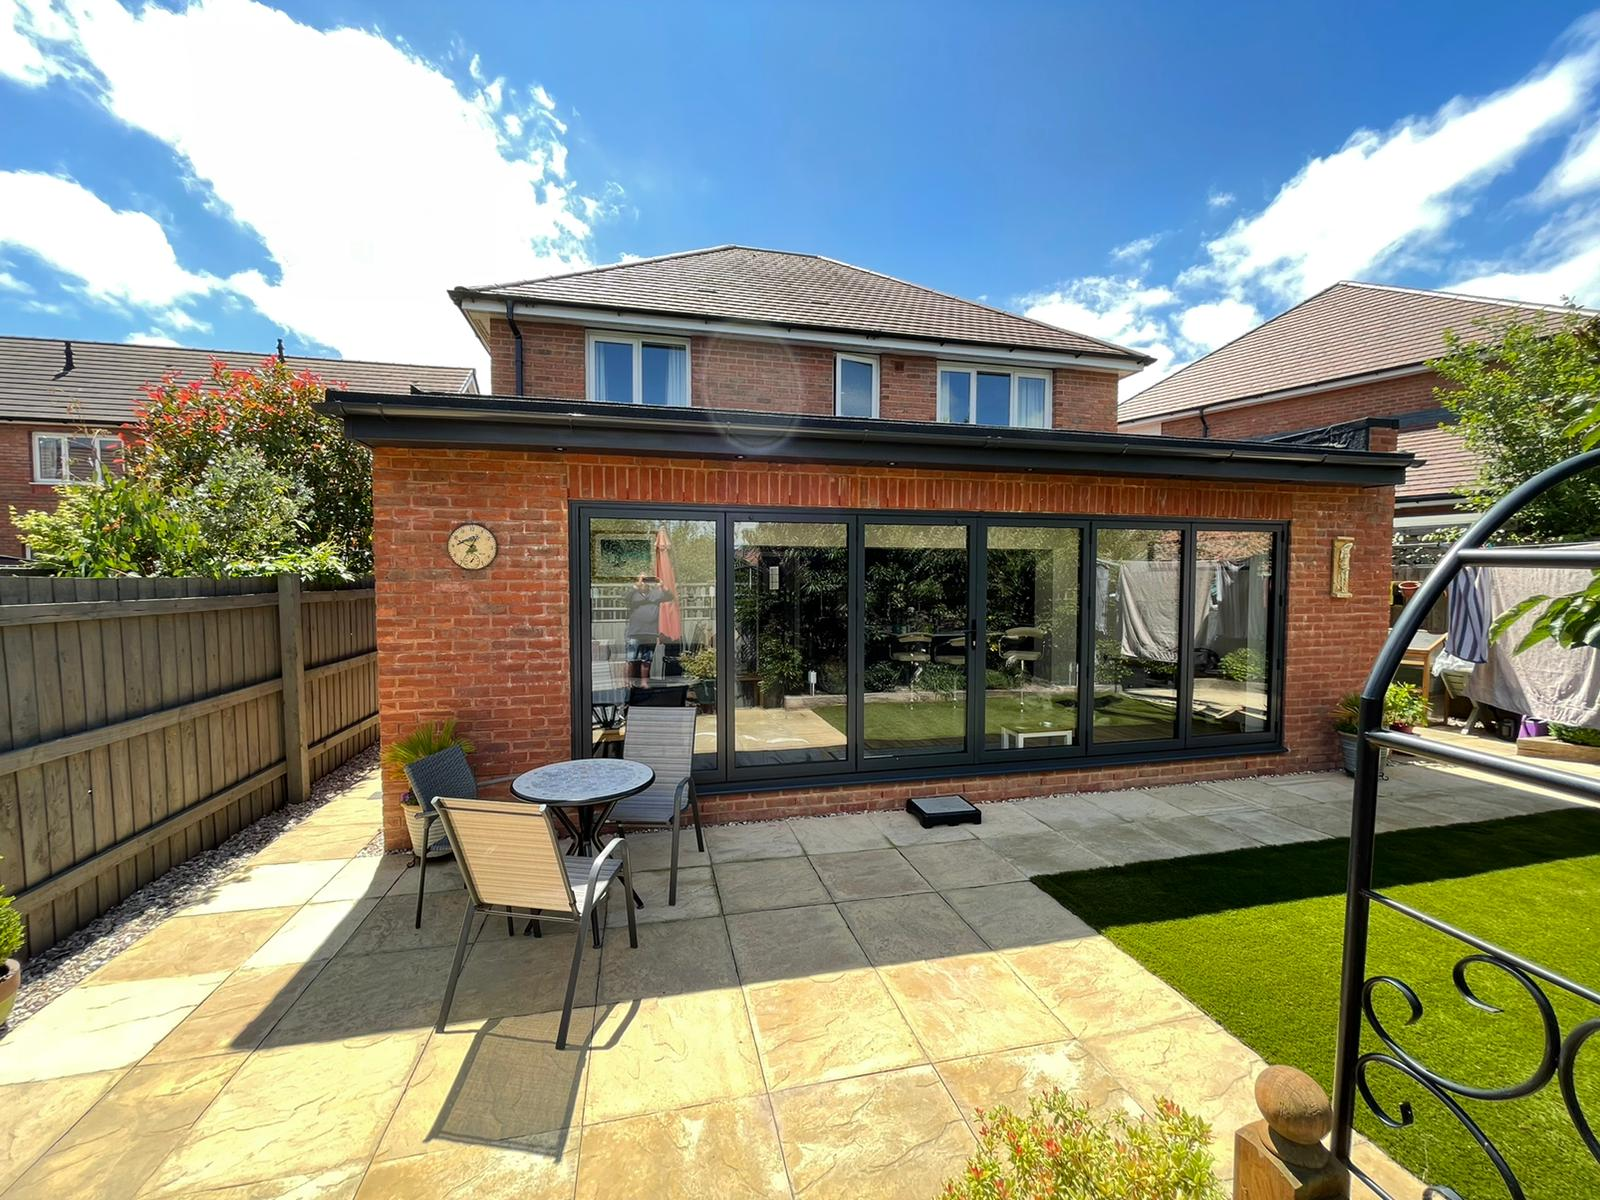 Torquay builders, Torquay Home Improvements